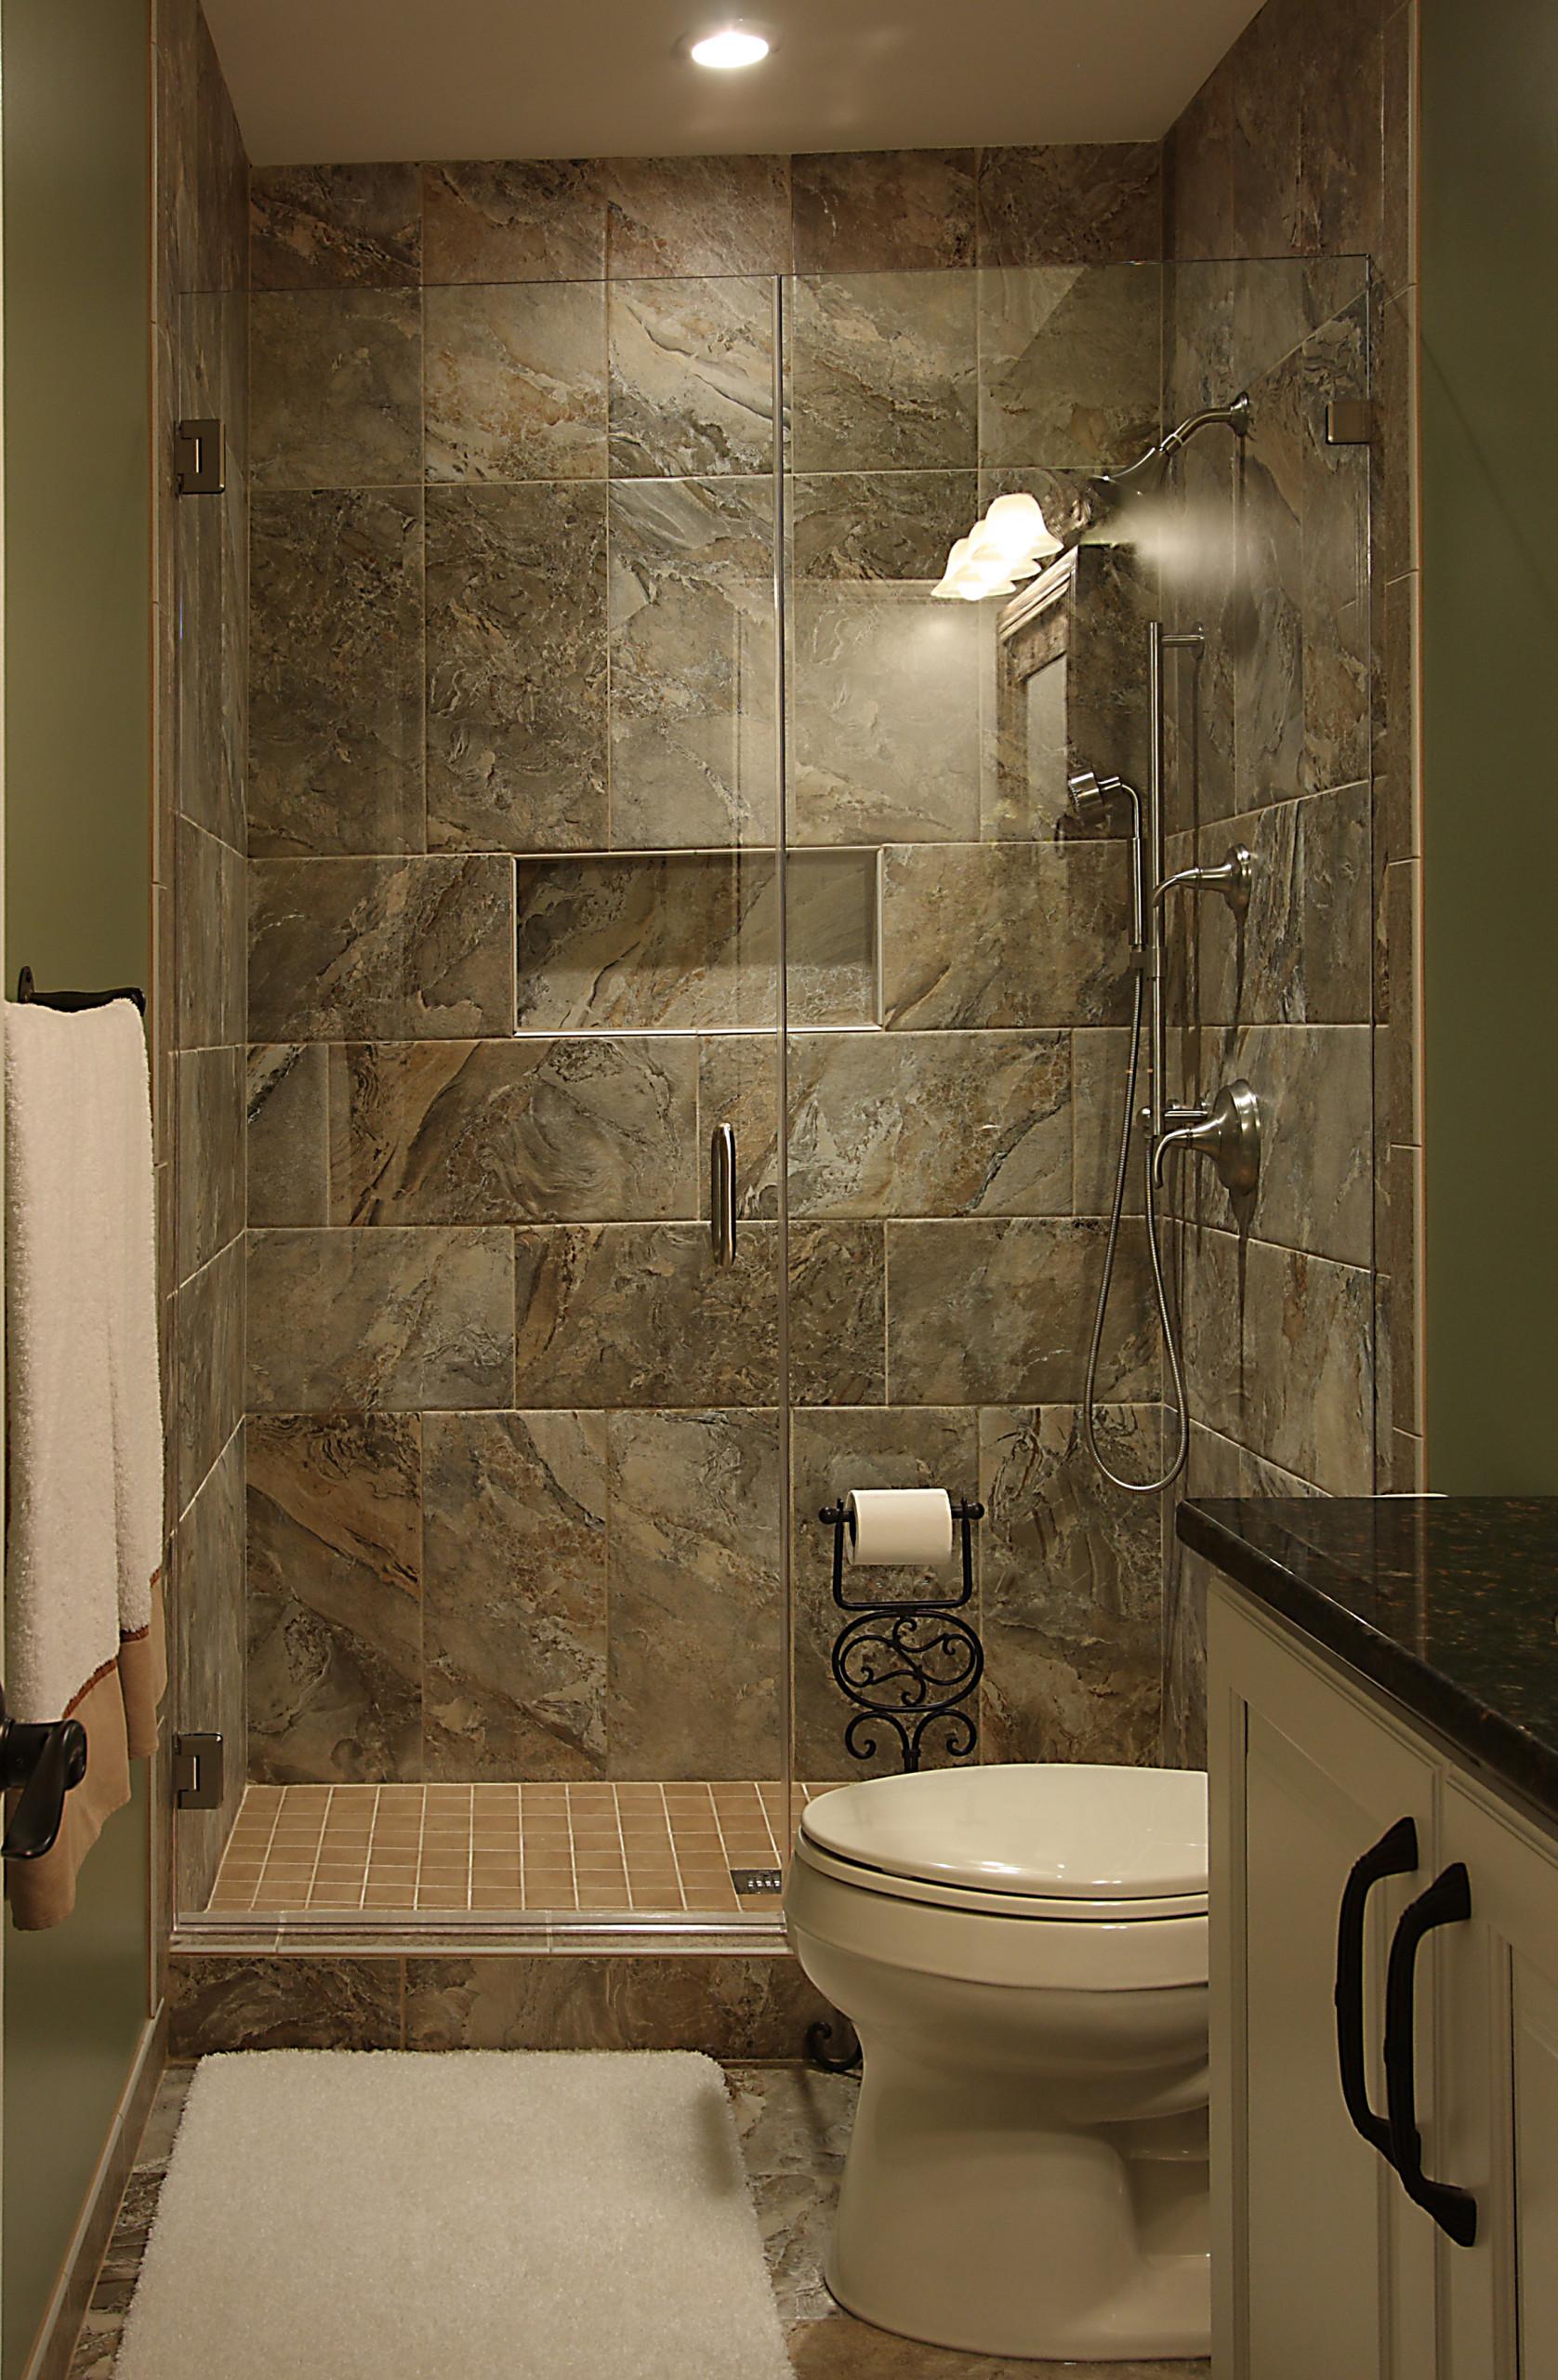 Basement Bathroom Houzz, Small Basement Bathroom Ideas